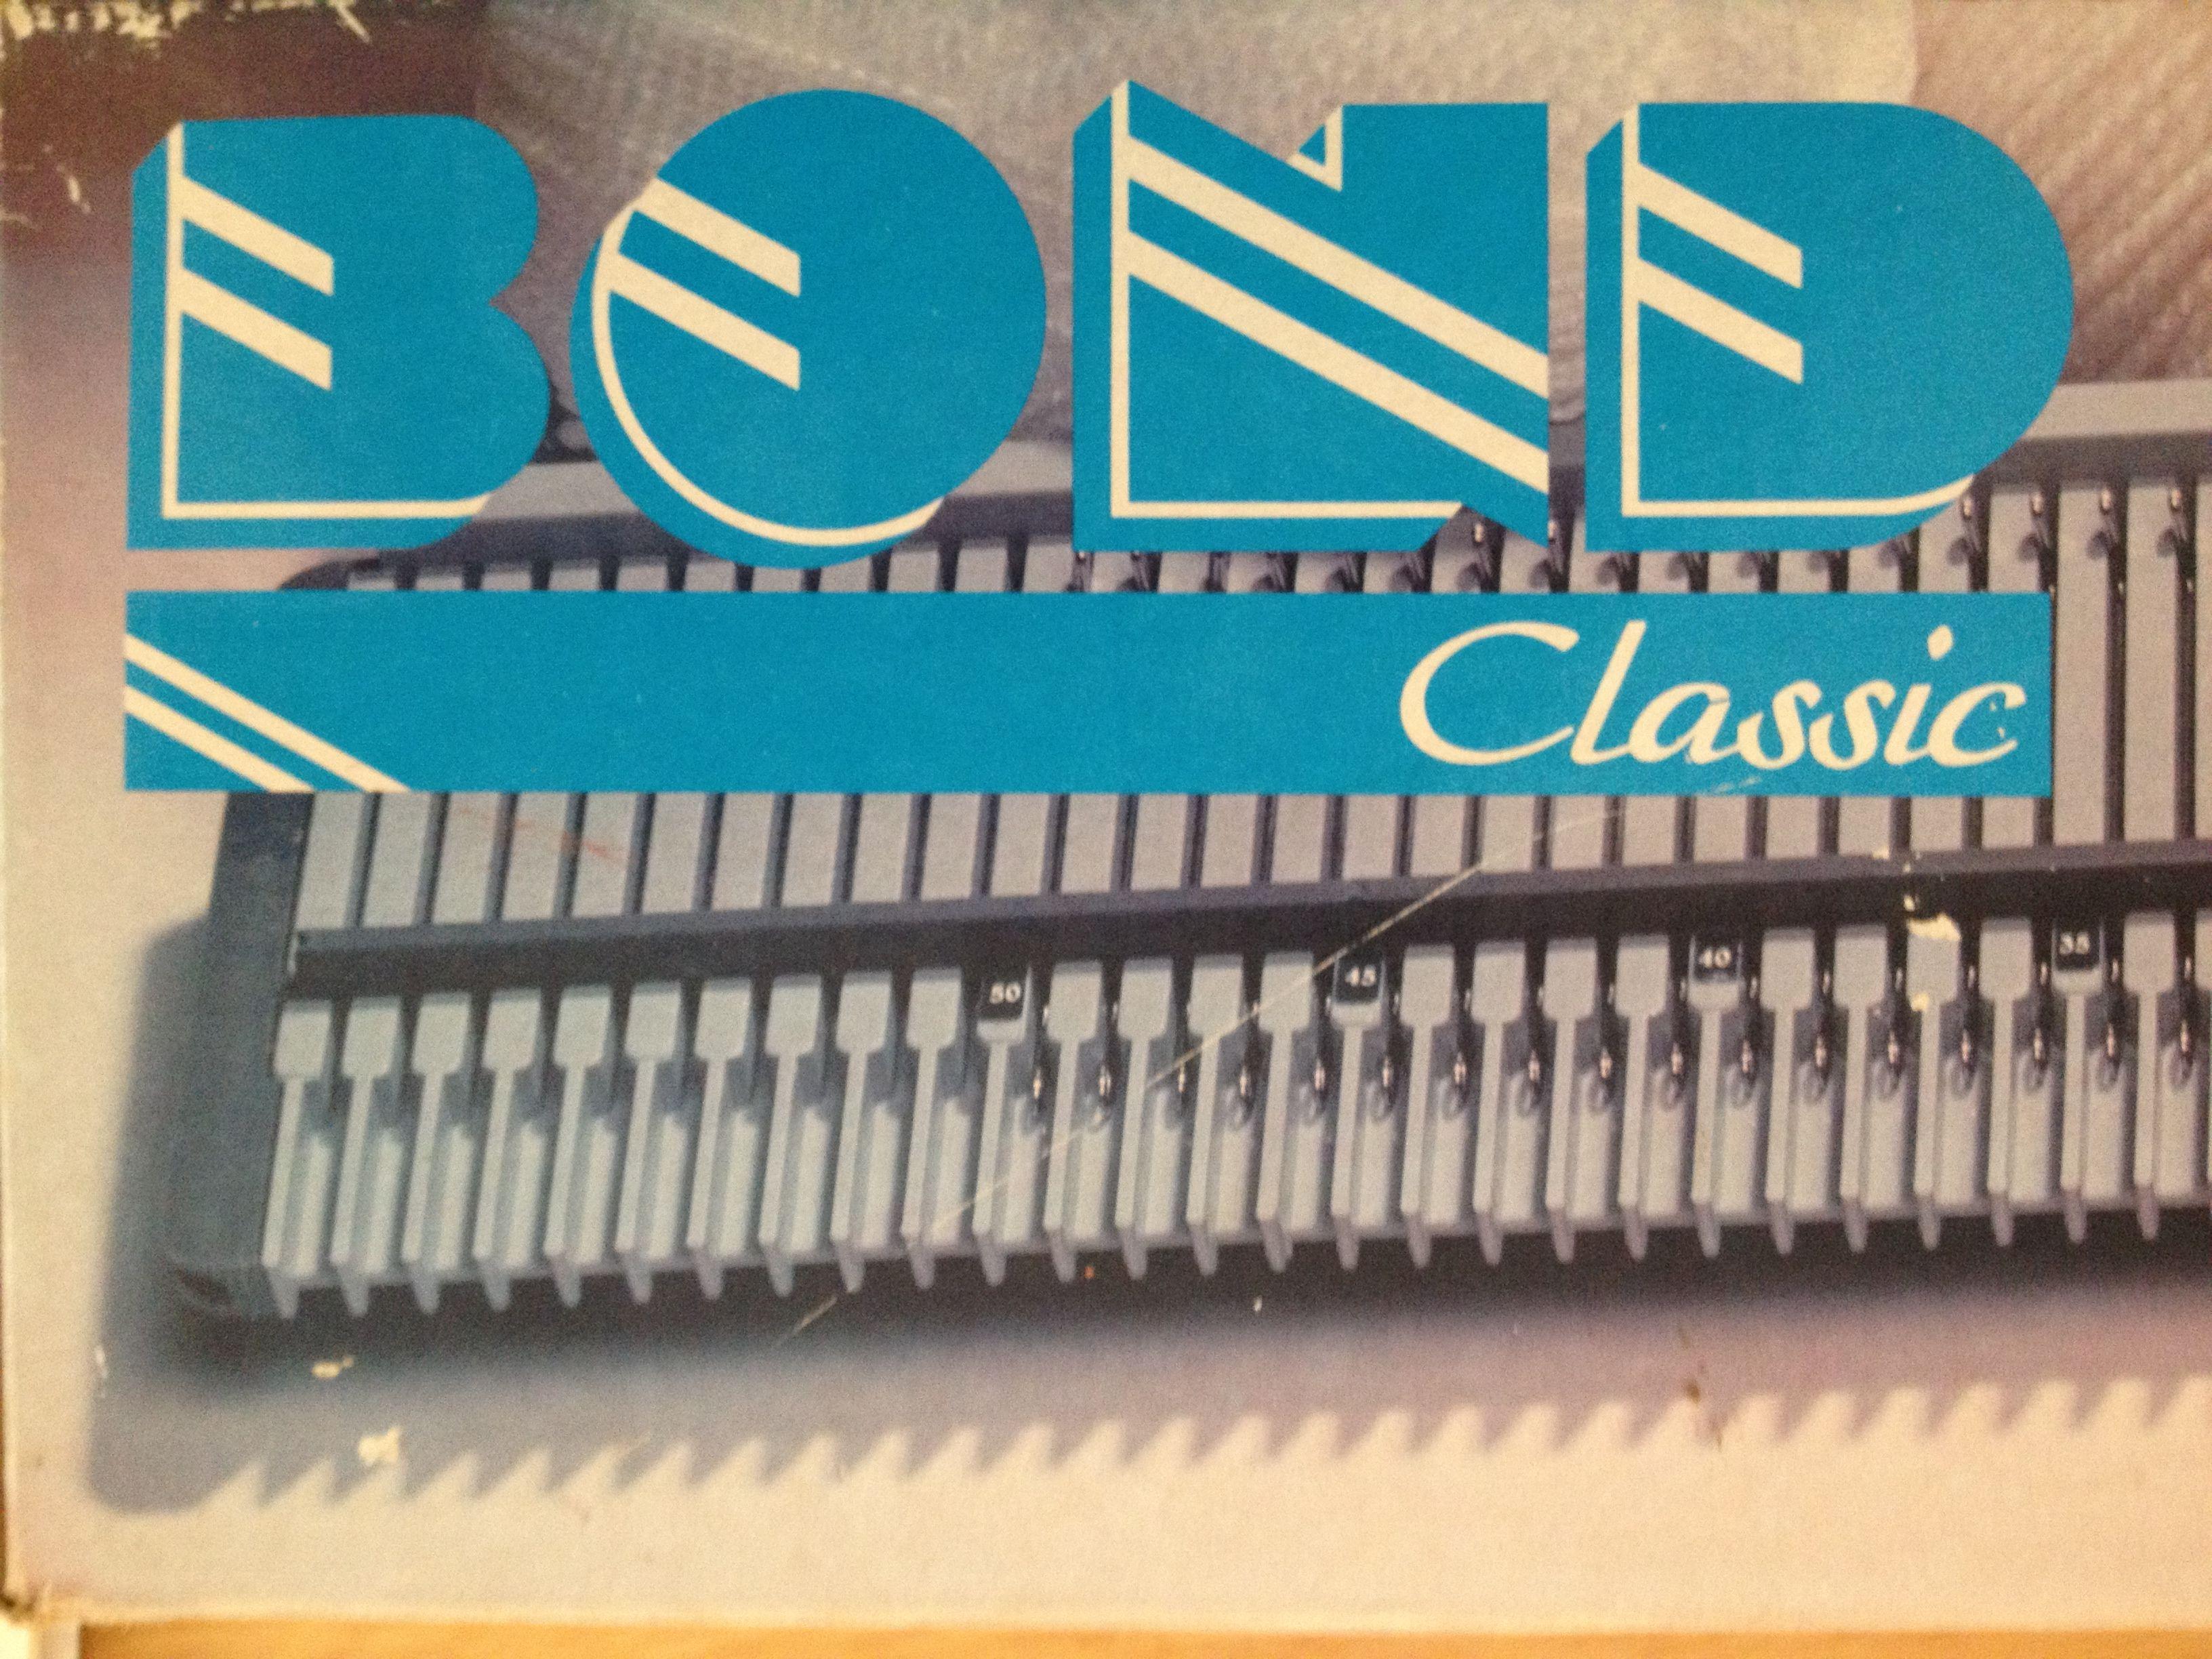 Bond classic knitting machine knitting machine pinterest bond classic knitting machine bankloansurffo Image collections